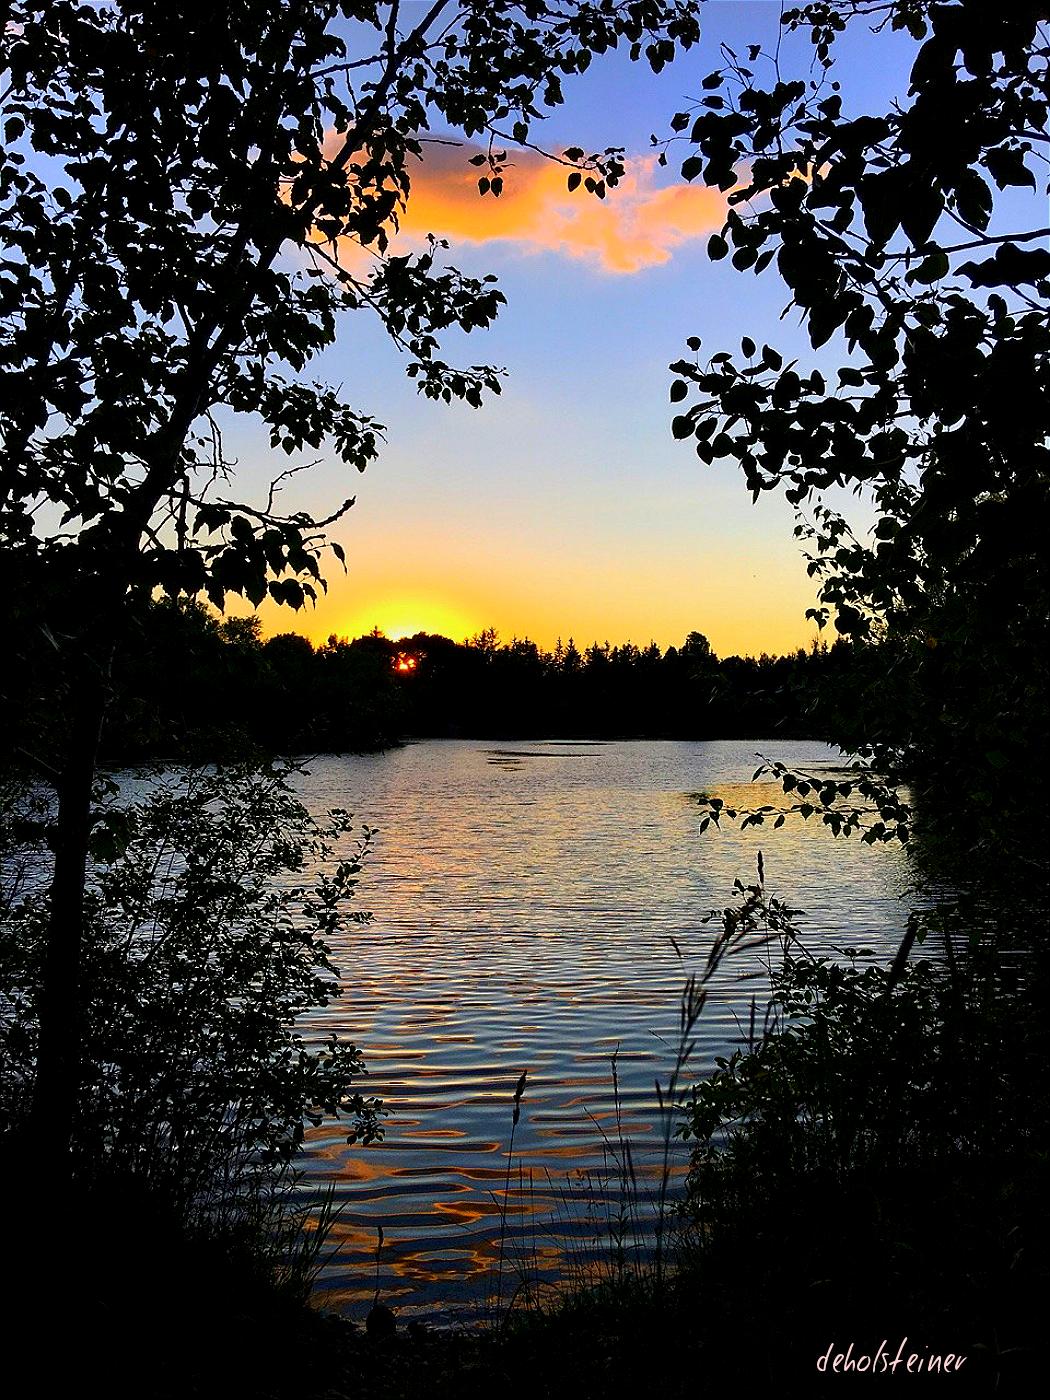 Good night friends nature night lake photography - Good night nature pic ...